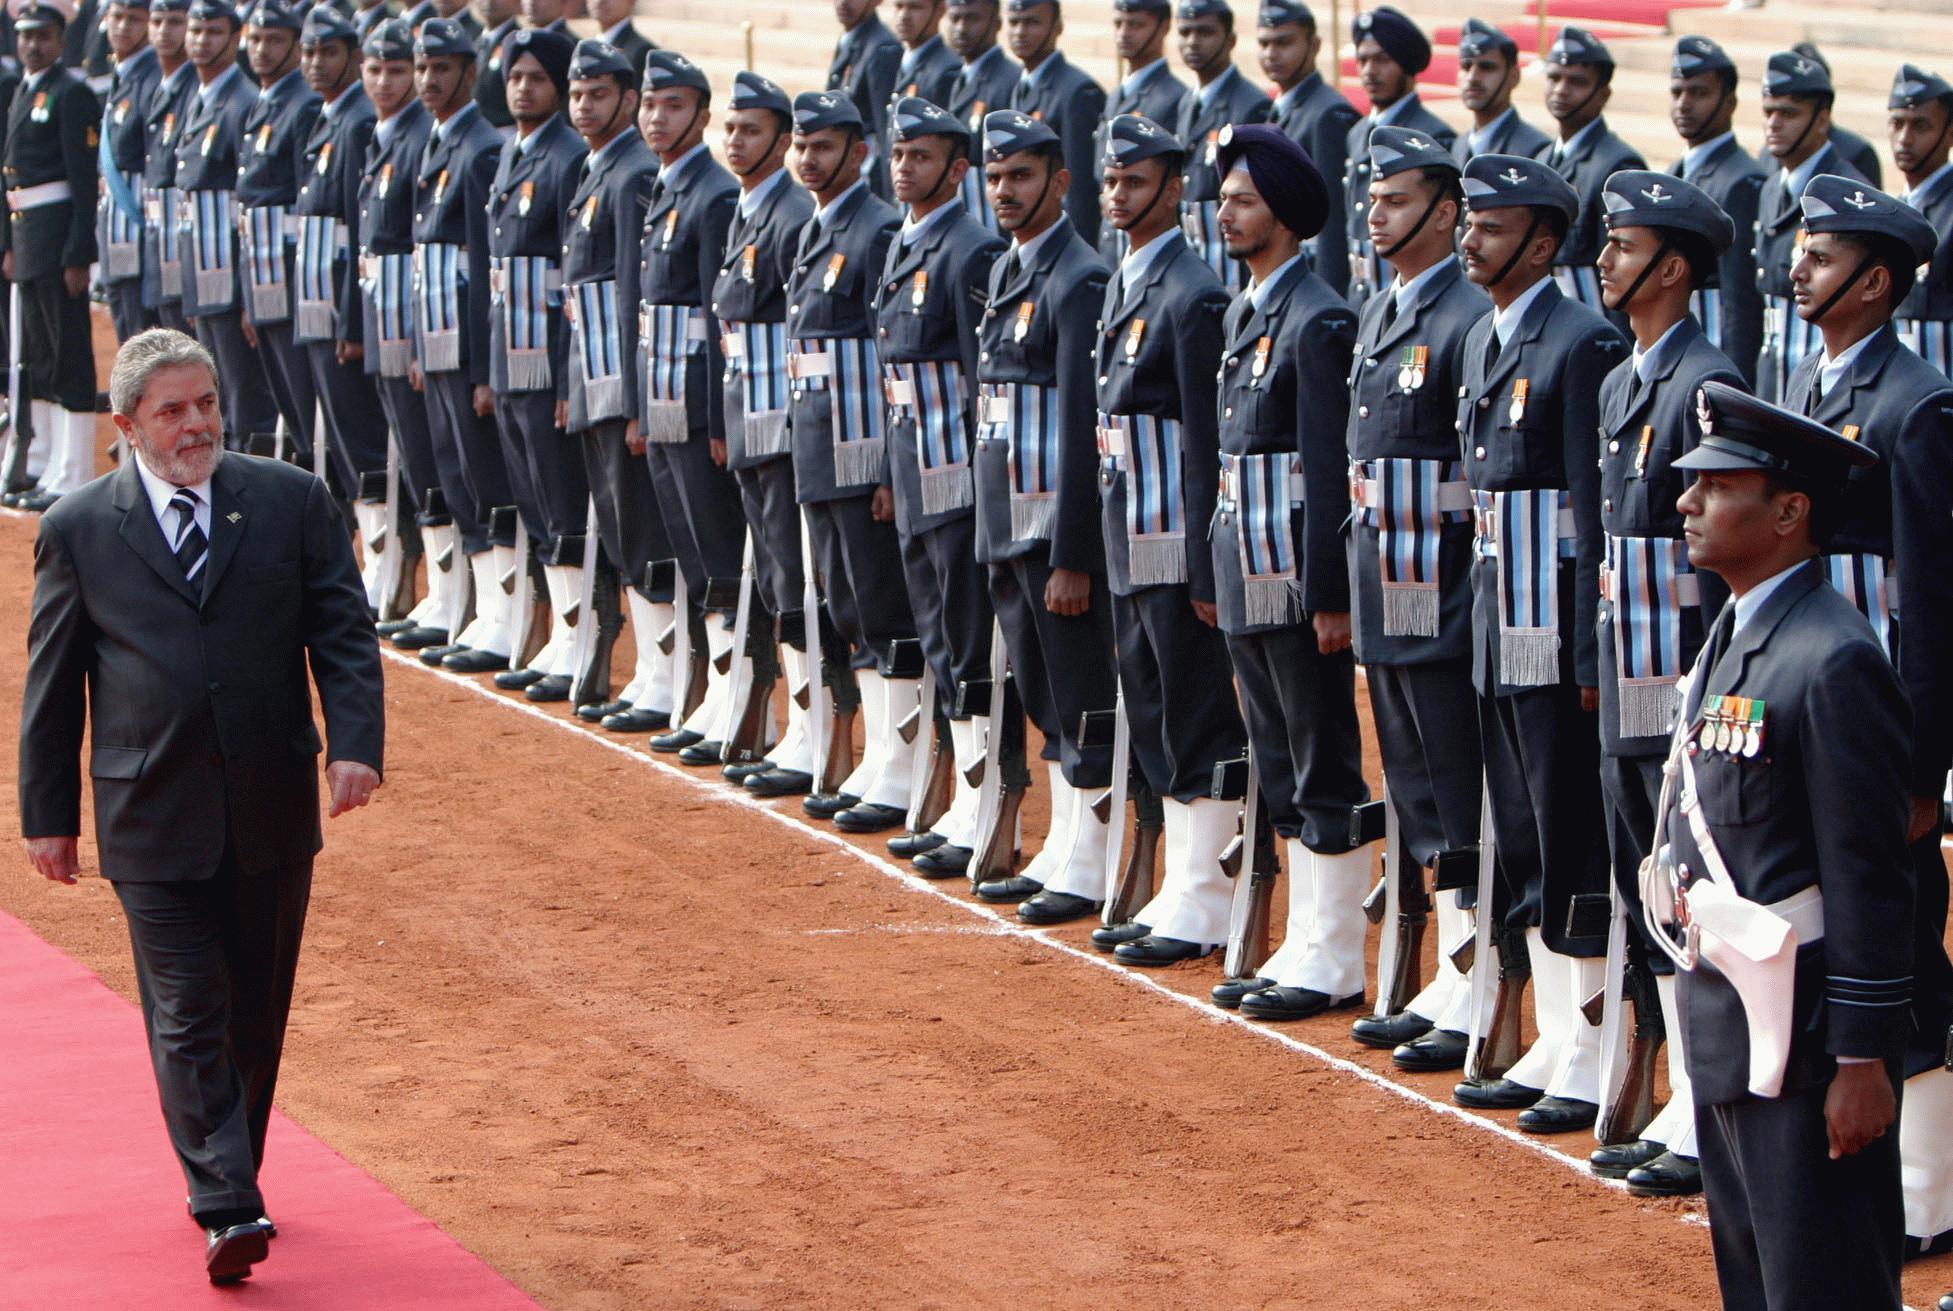 https://i0.wp.com/upload.wikimedia.org/wikipedia/commons/1/19/Indian_Air_Force-GoH.jpeg